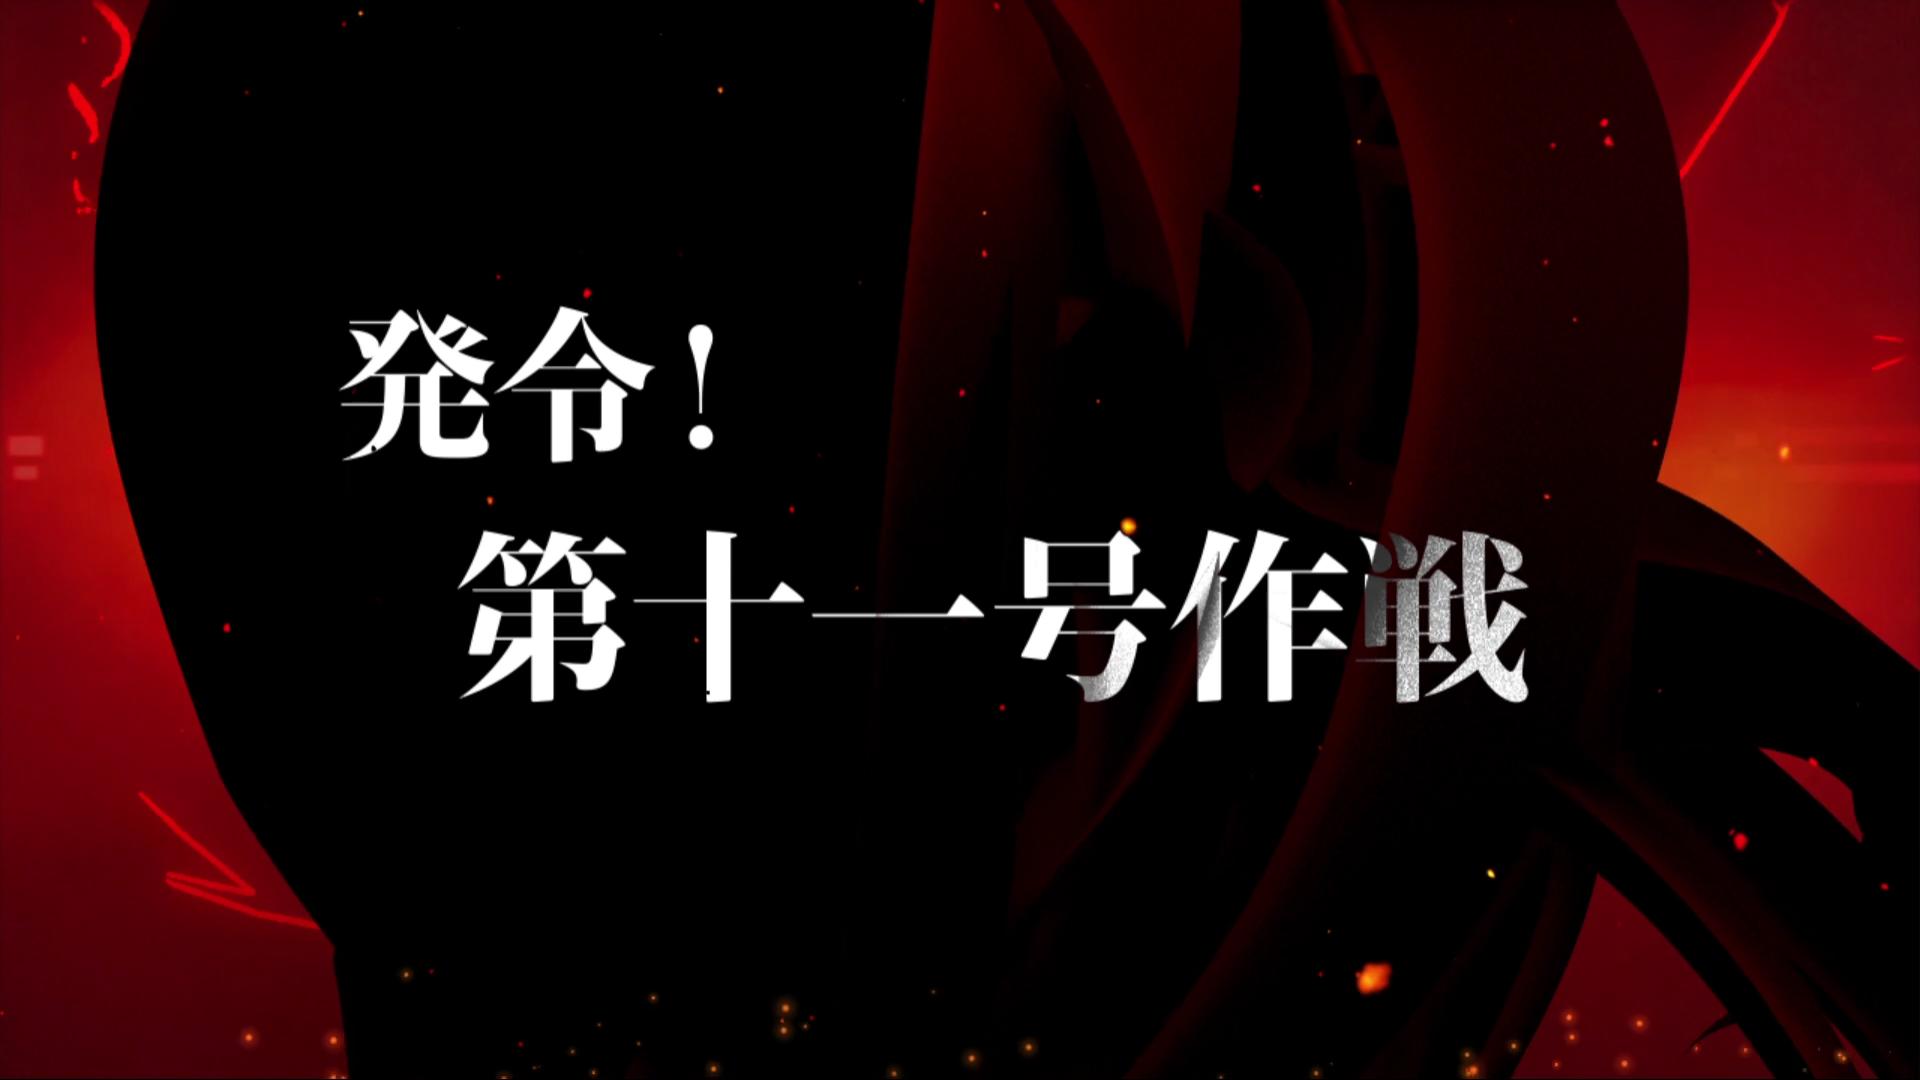 【AC】超大規模作戦!! -イベント続報-